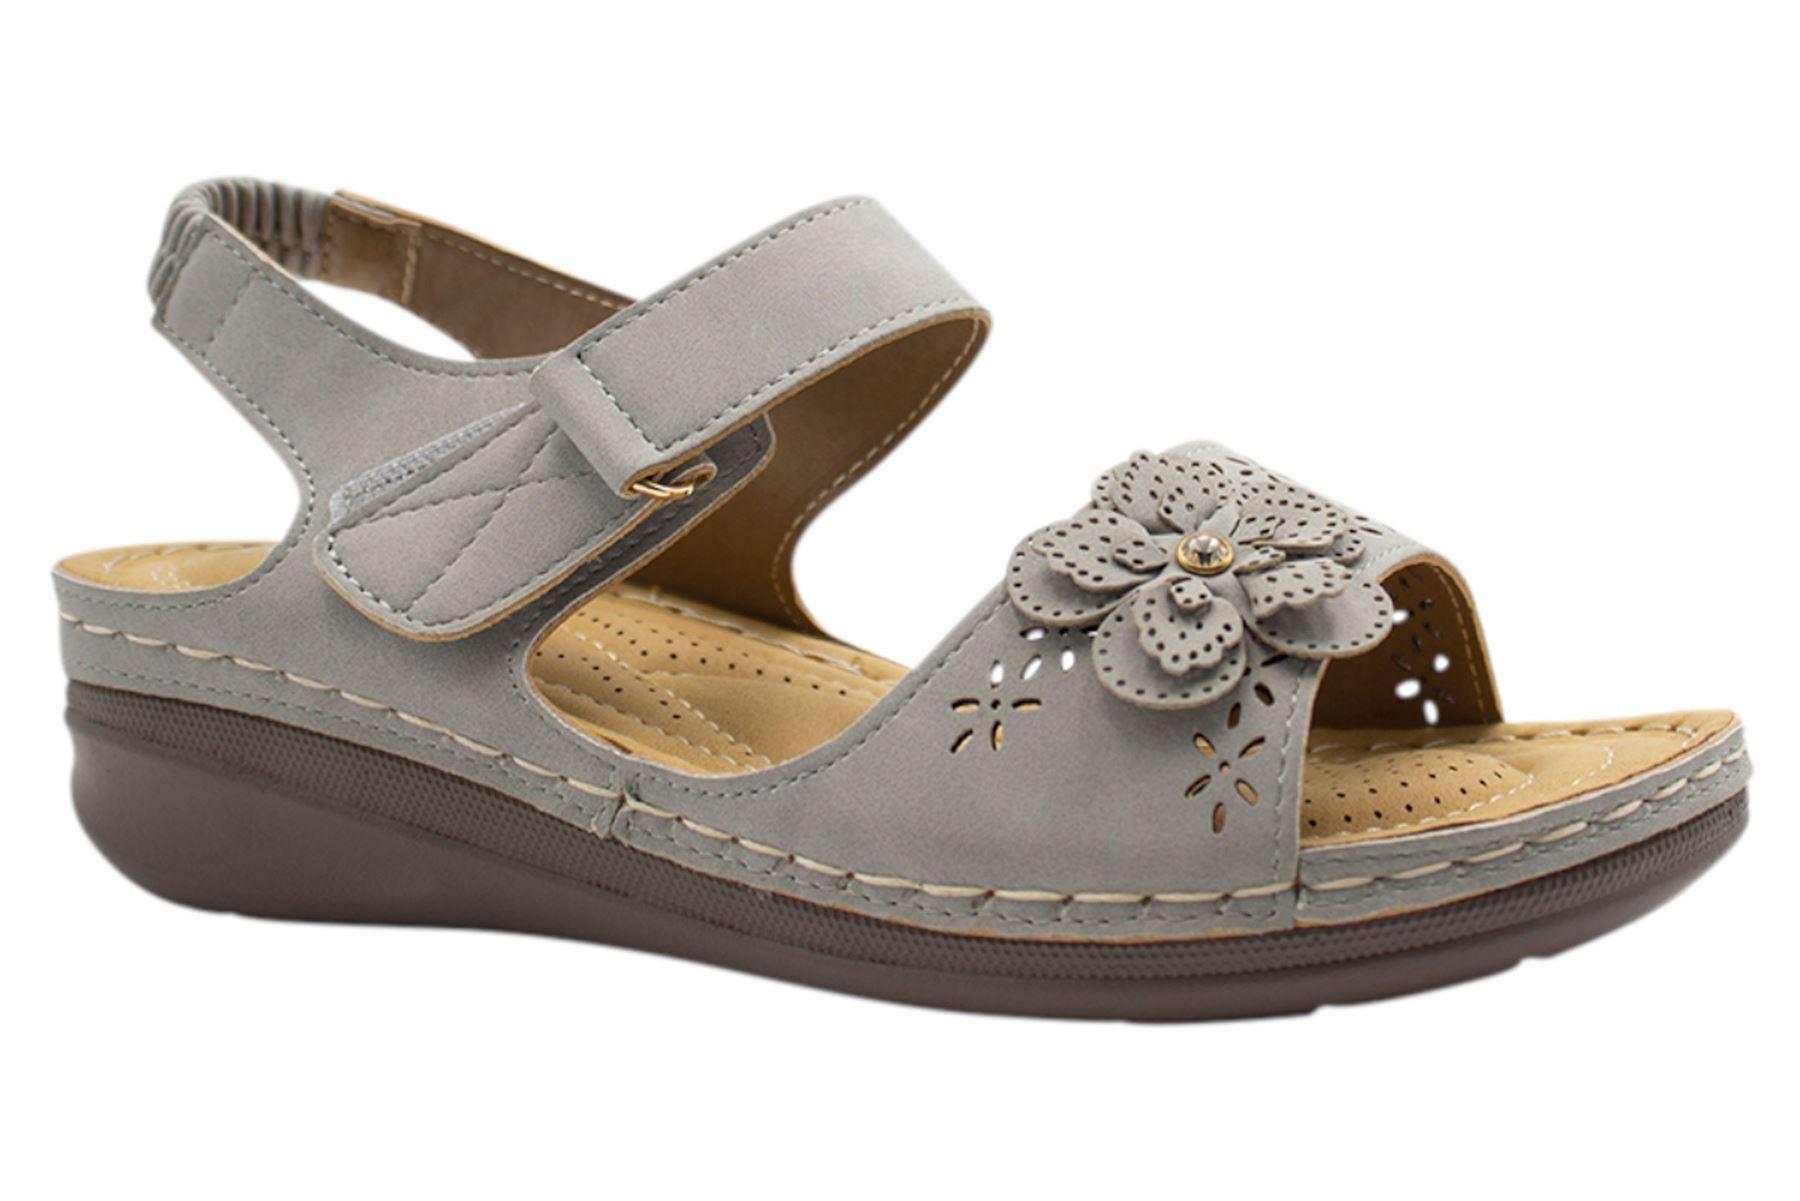 Ladies-Sandals-Womens-Mid-Heel-Comfort-Summer-Beach-Casual-Wear miniatura 28